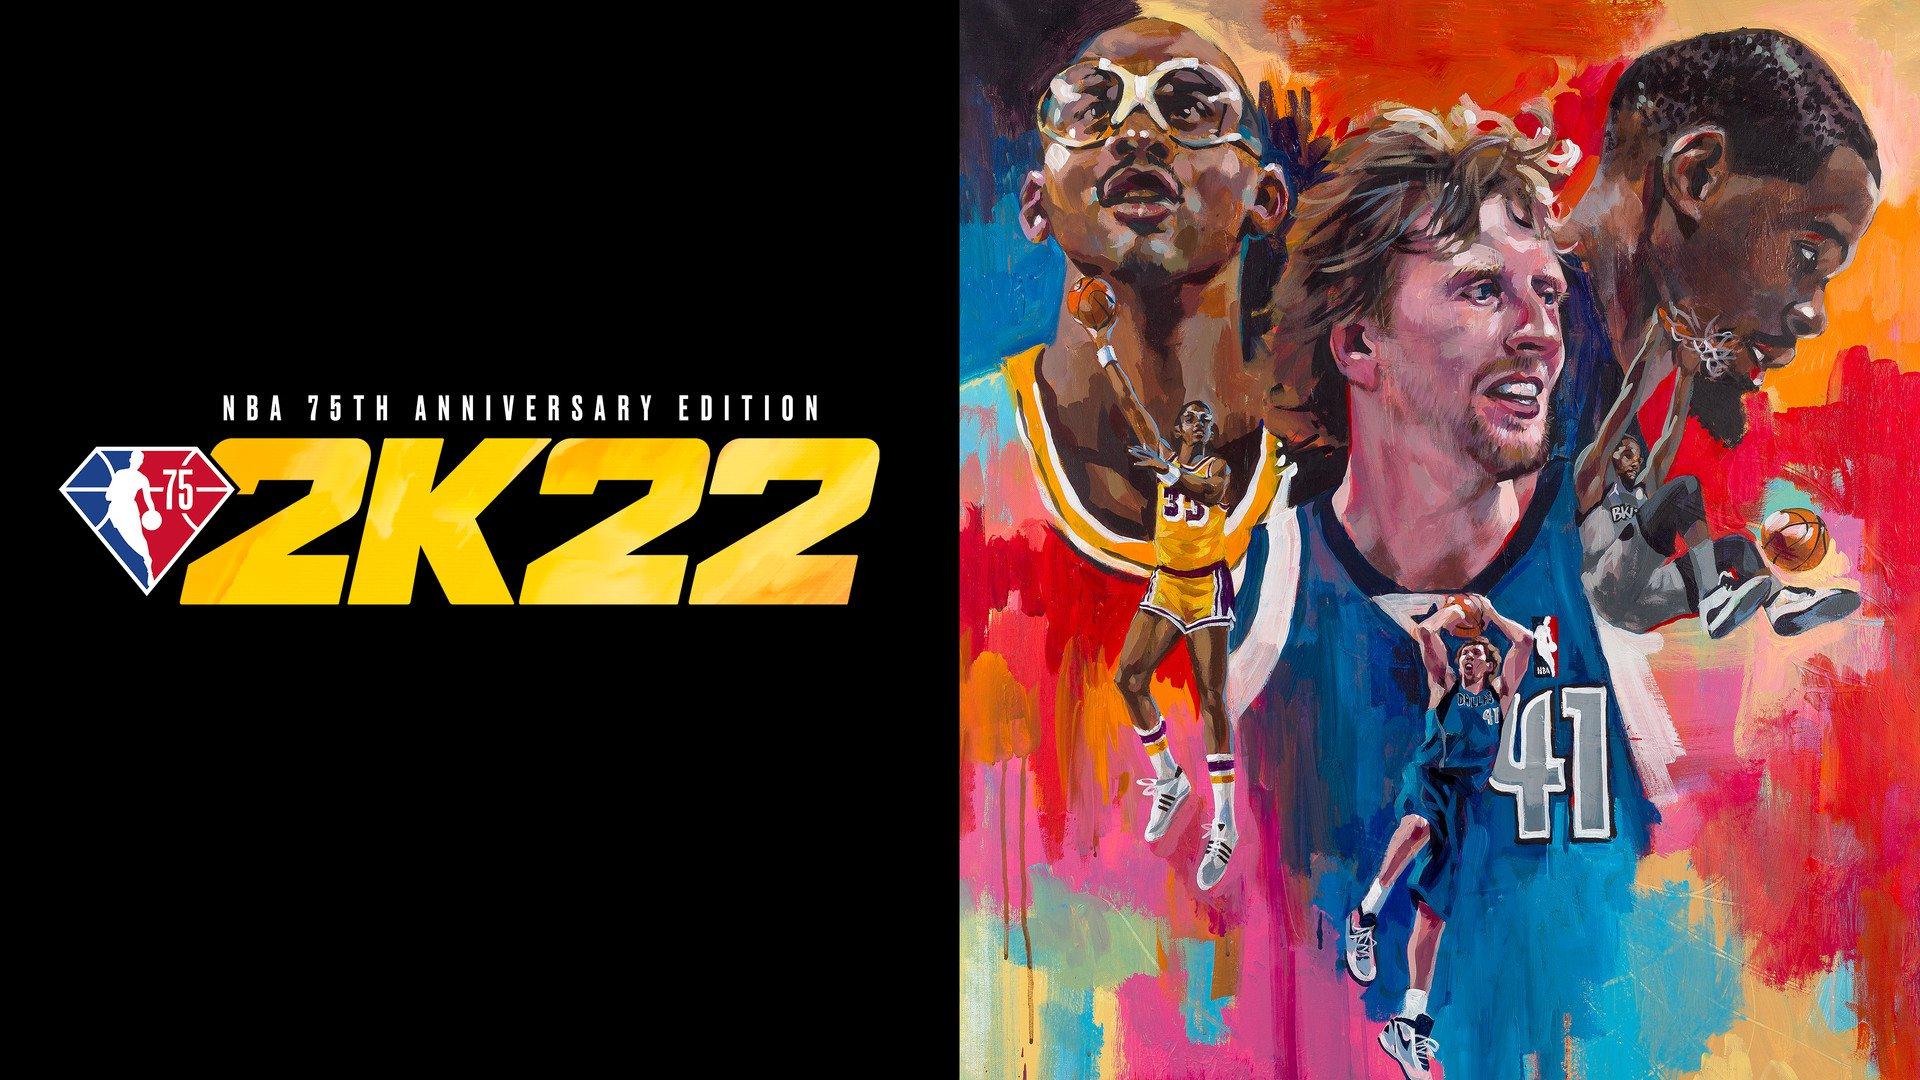 2K22 NBA 75th Anniversary Edition 6